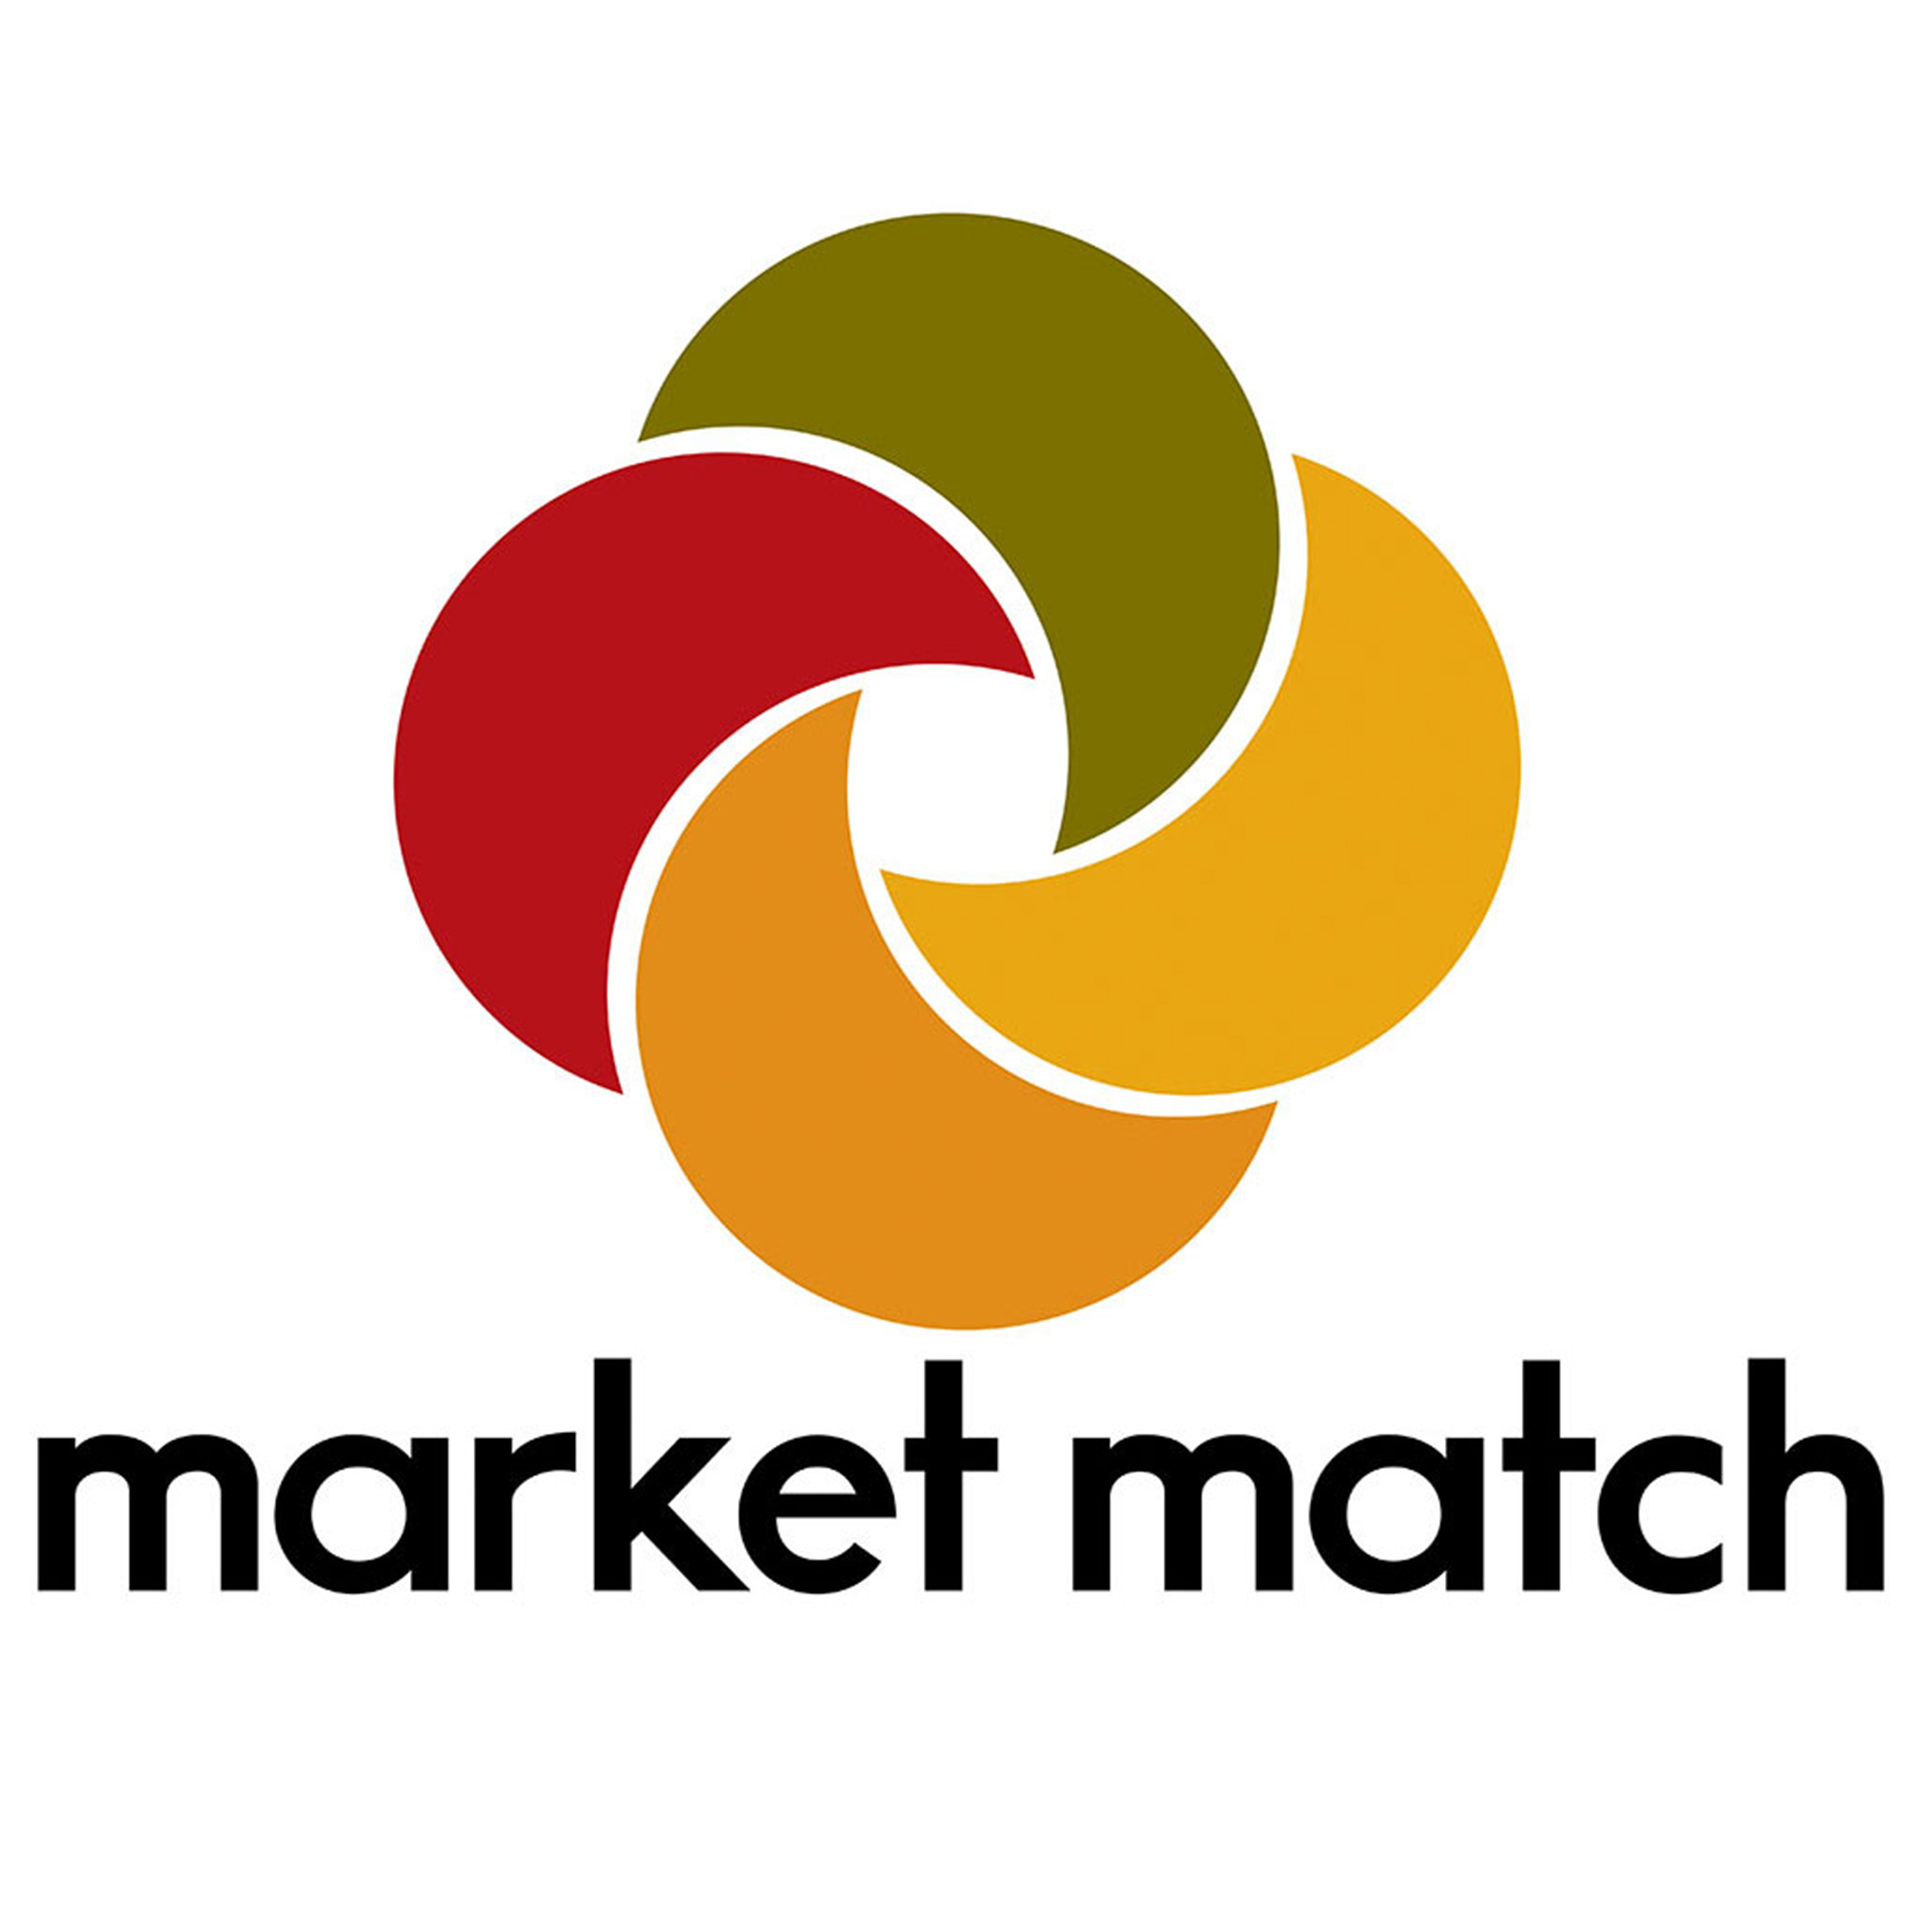 martket-match-square.jpg